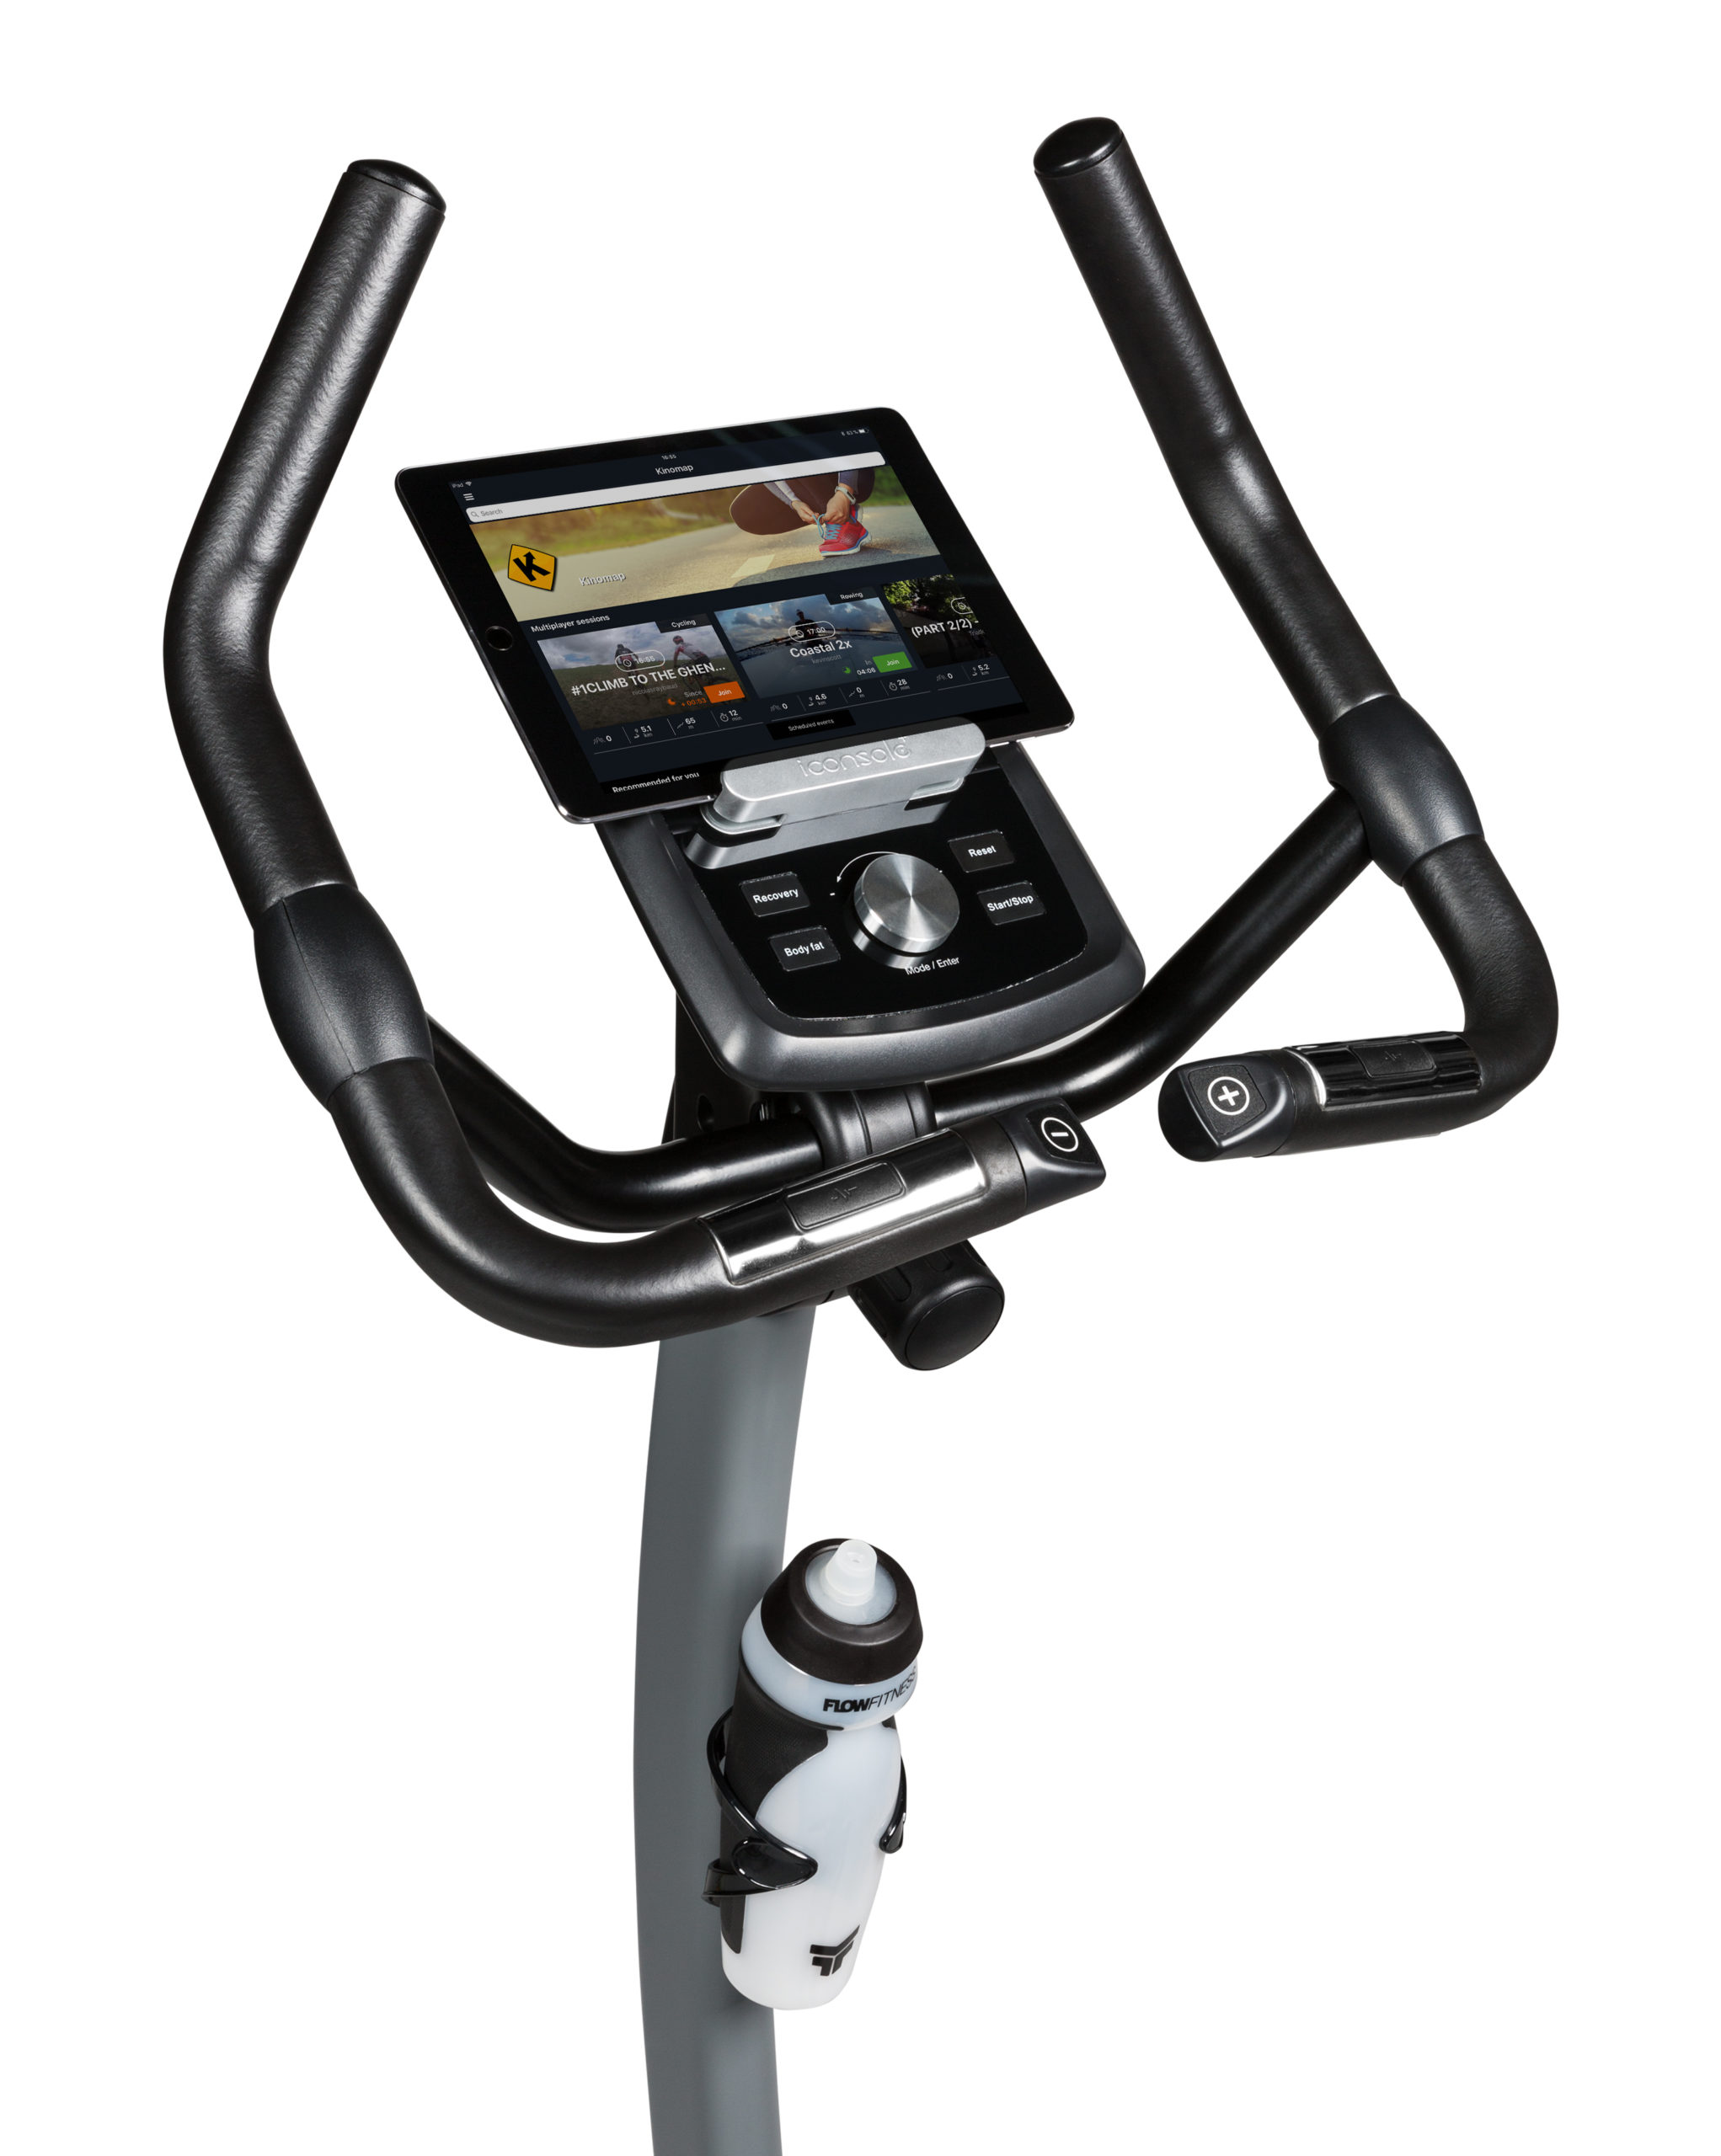 Flow Fitness Tabel Turner DHT2500i Hometrainer 8